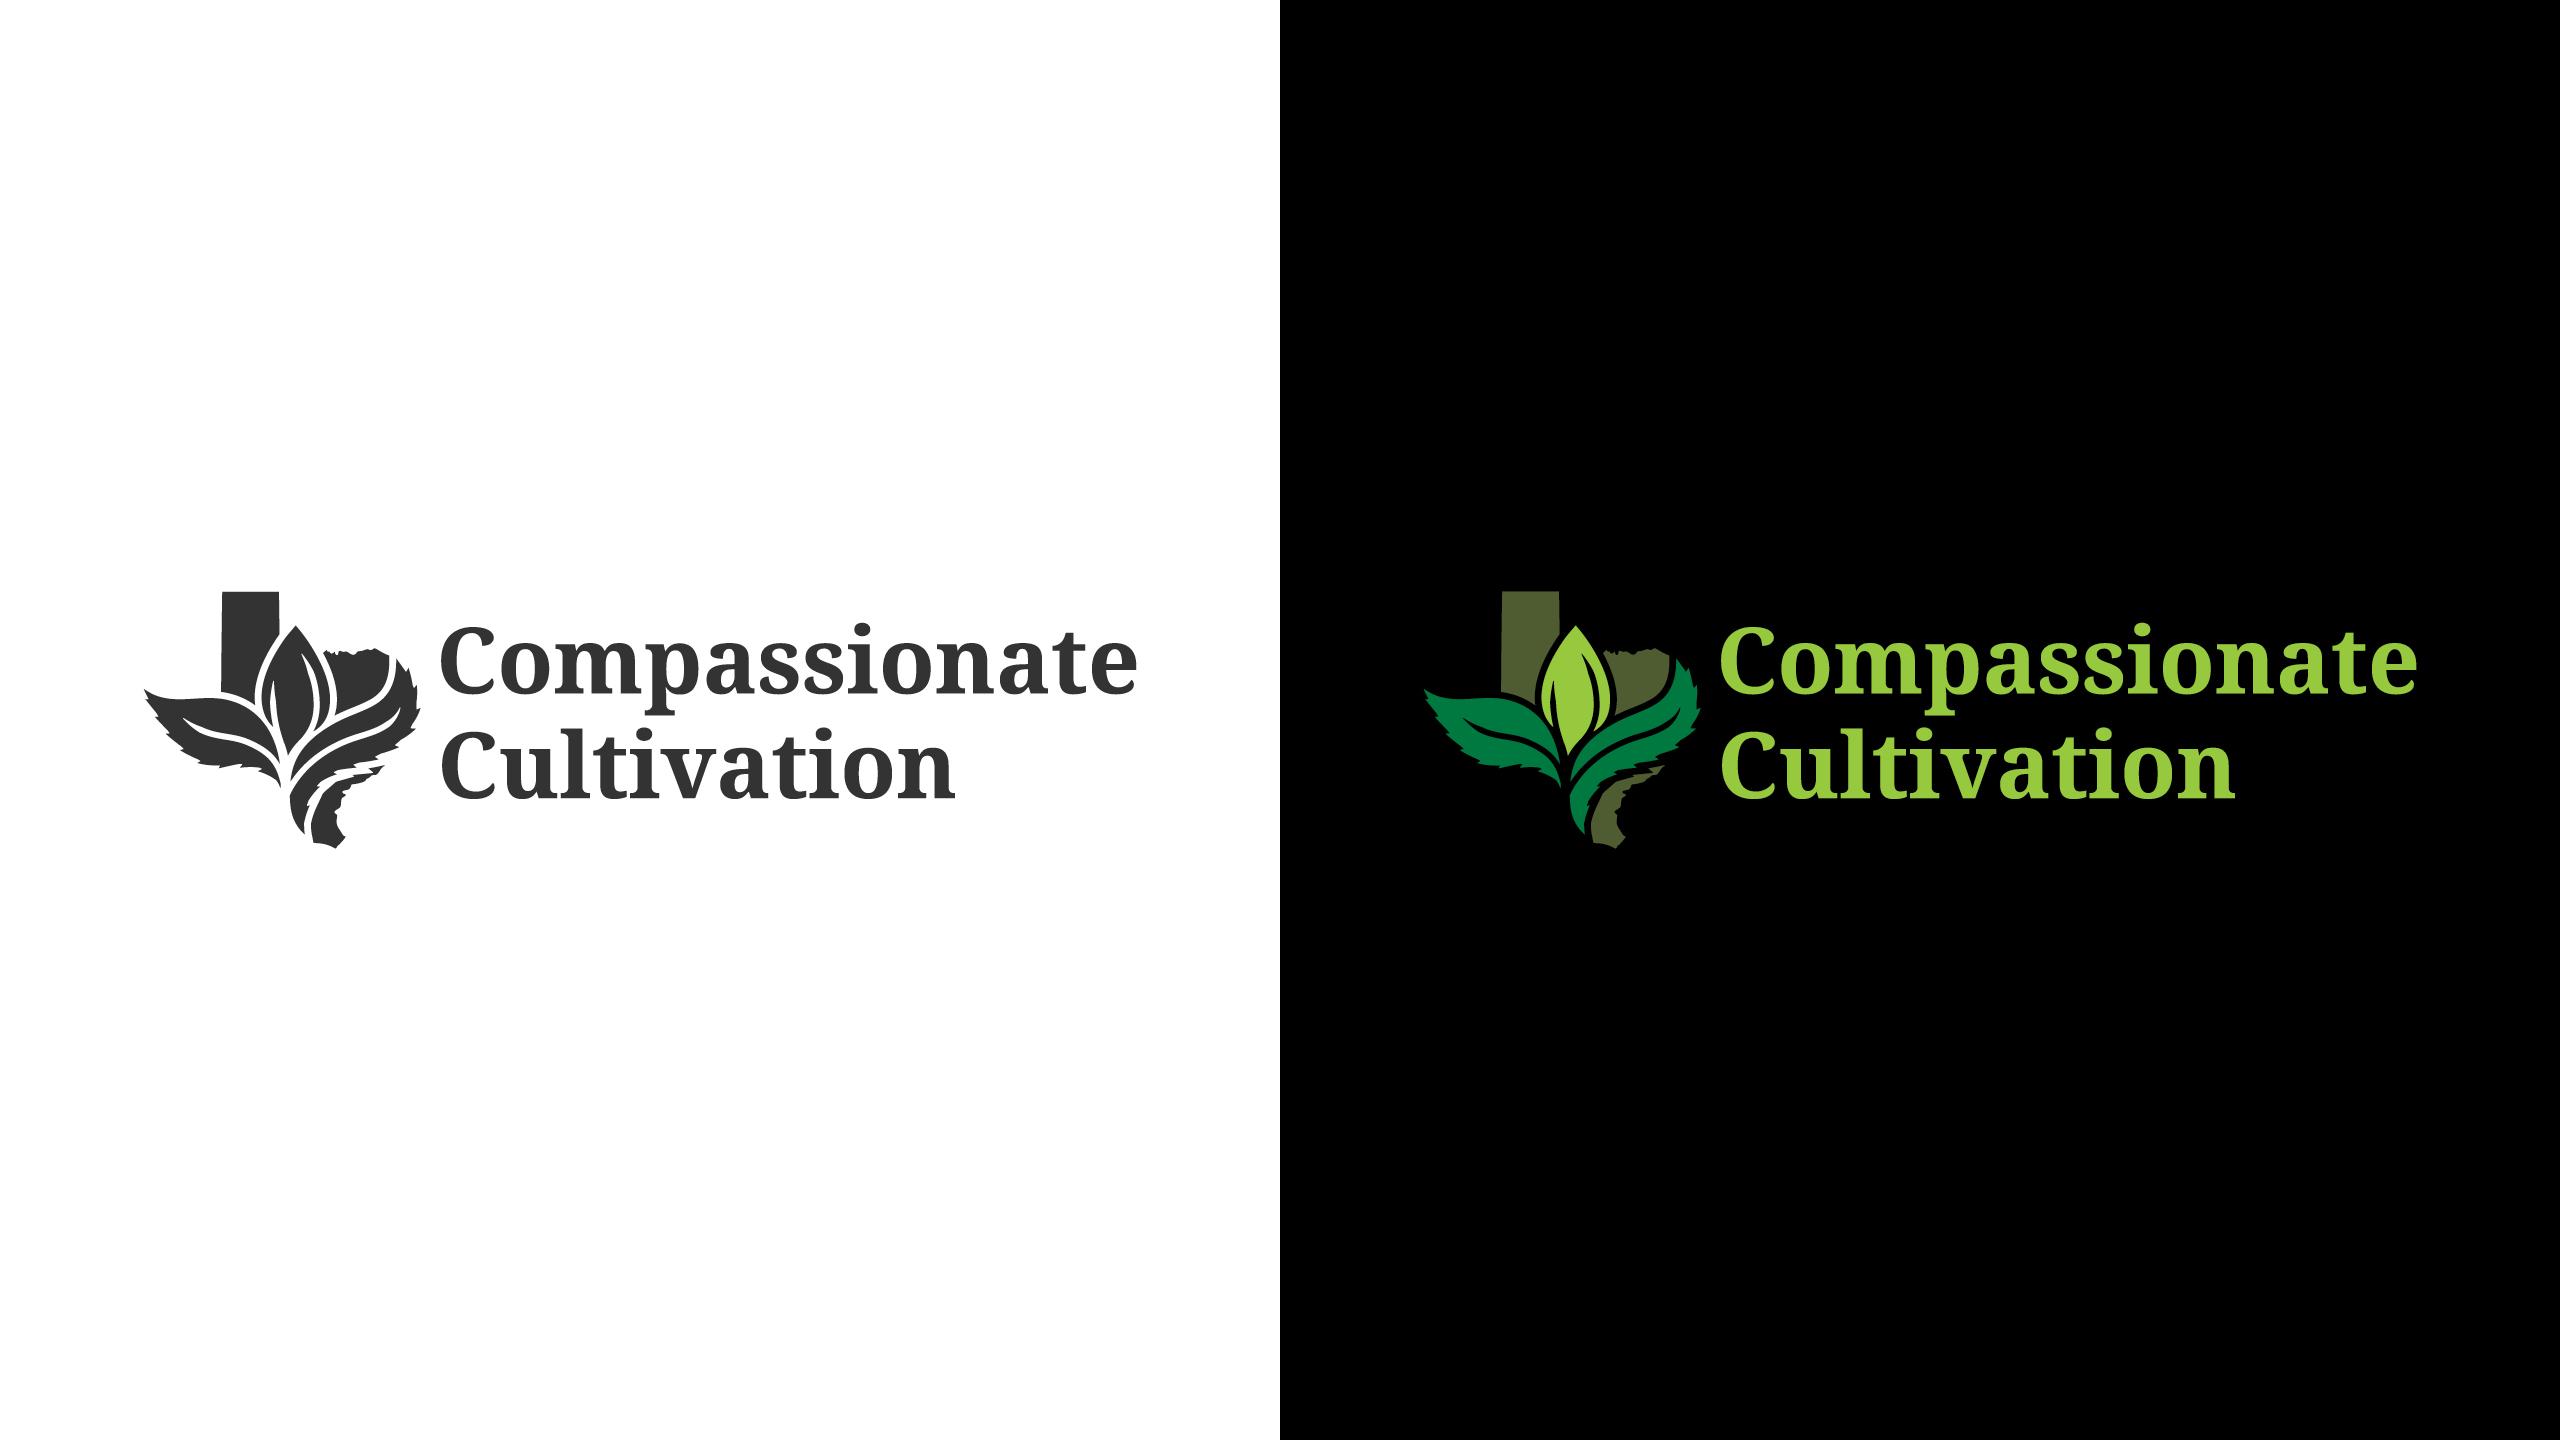 Texas Original Cannabis Company Brand Identity by High Road Design Studio